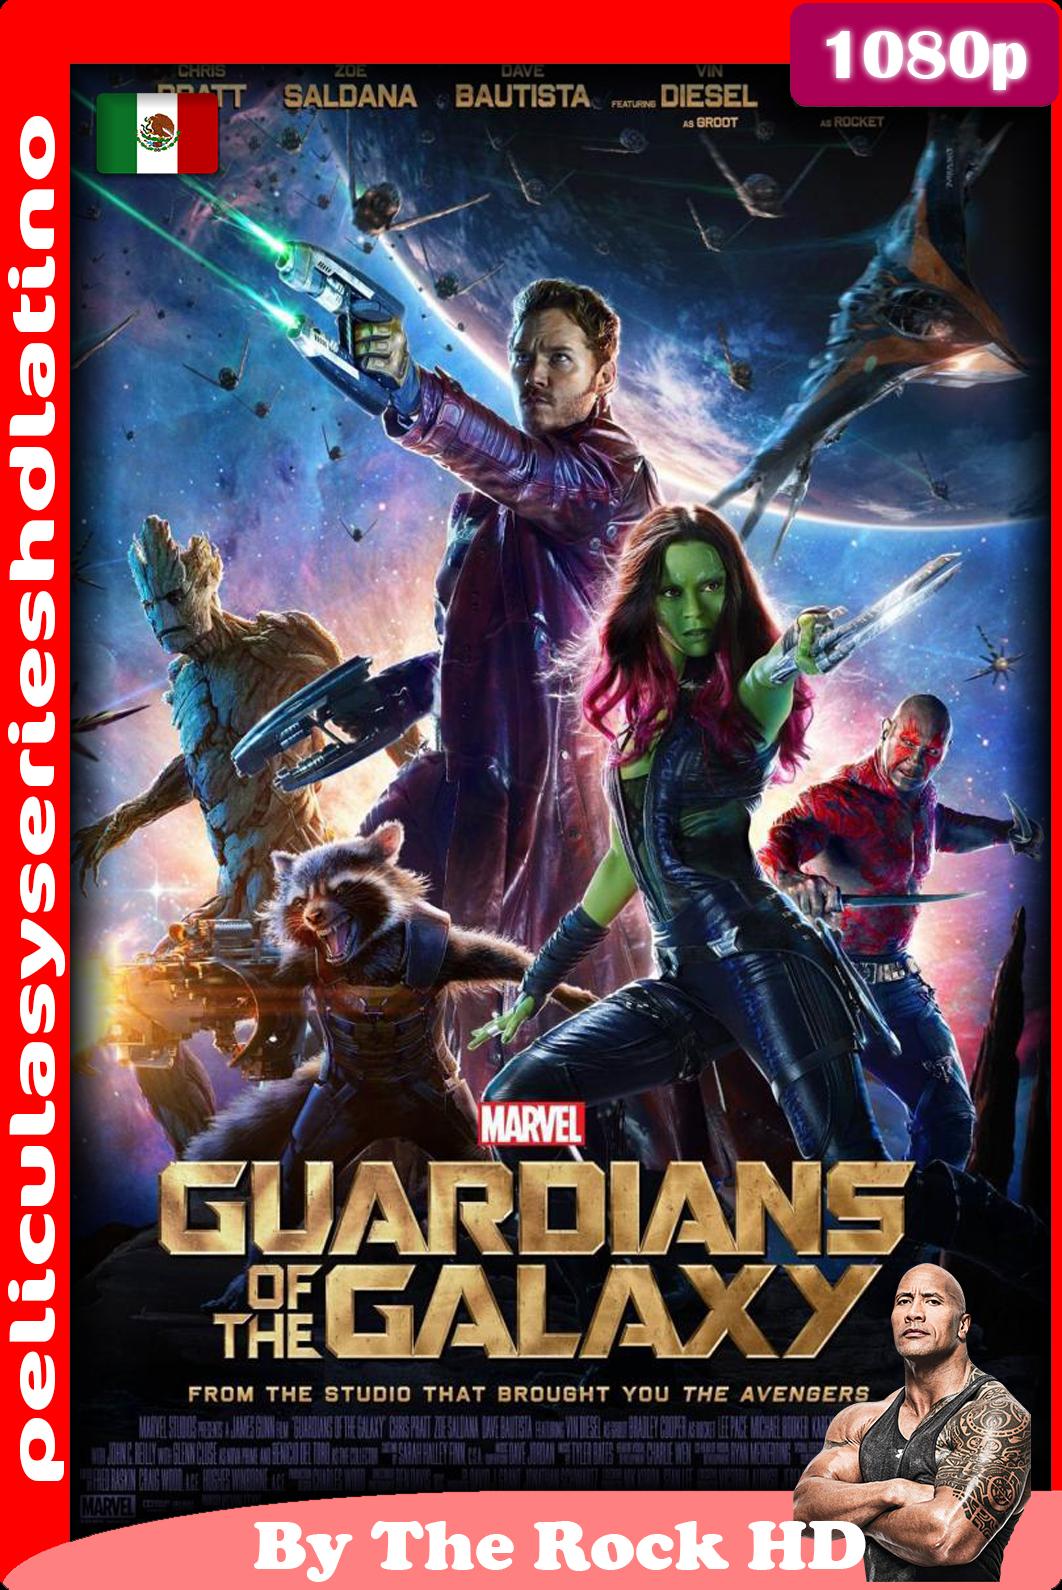 Guardianes de la galaxia, (2014)[1080p] [Latino] [Google Drive]